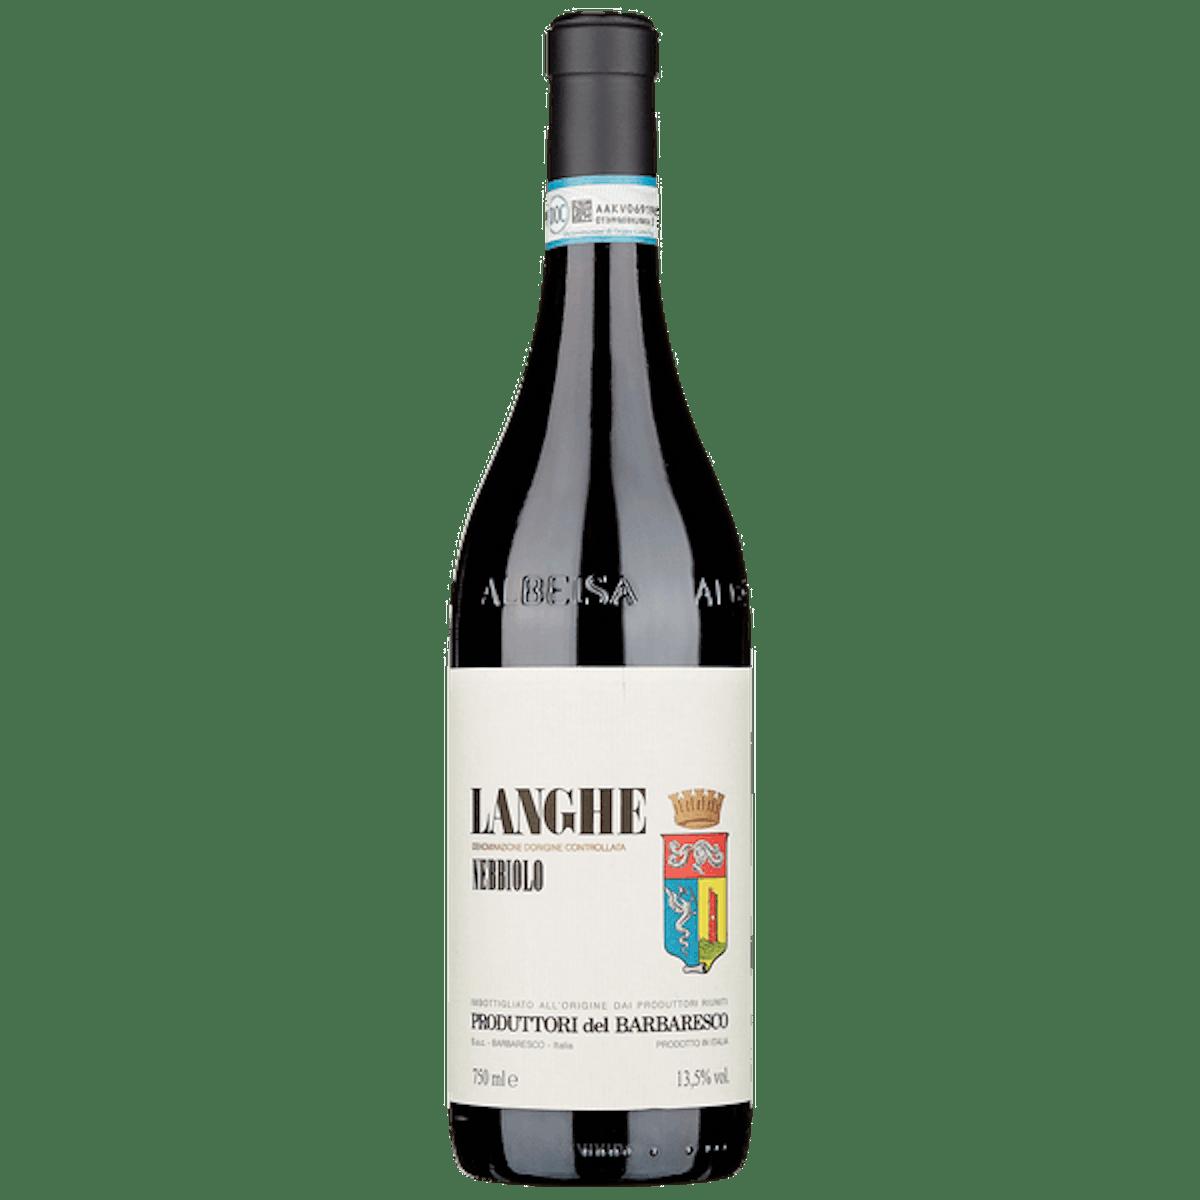 Langhe Nebbiolo, 2019